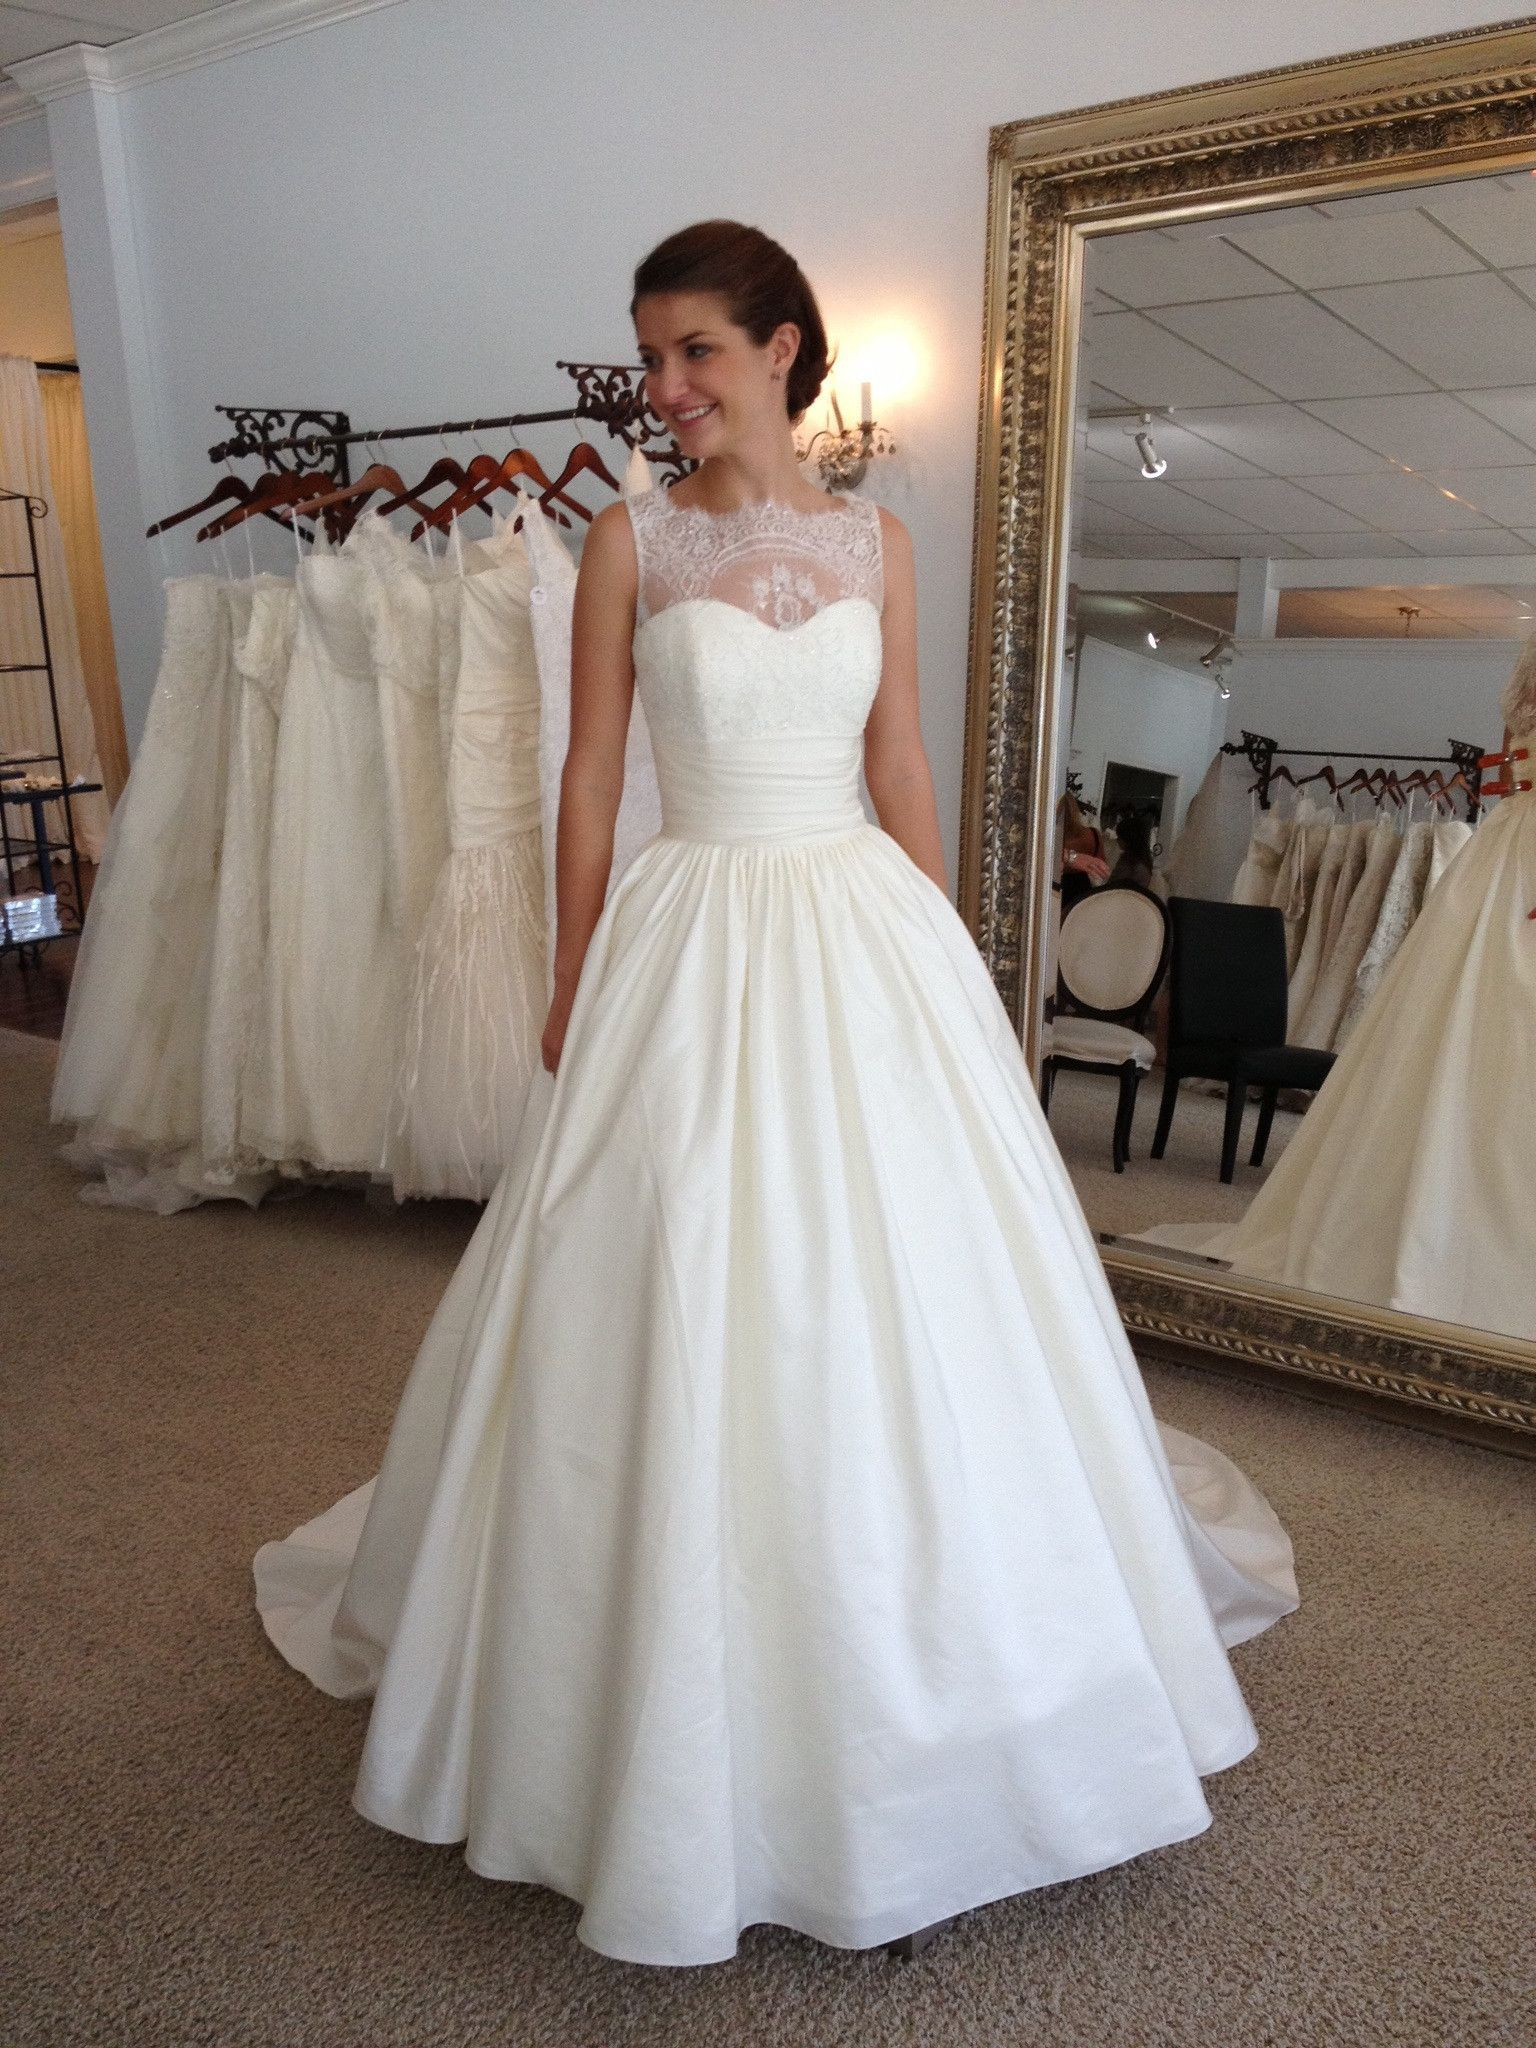 August Jones Paz New Wedding Dress Size 2